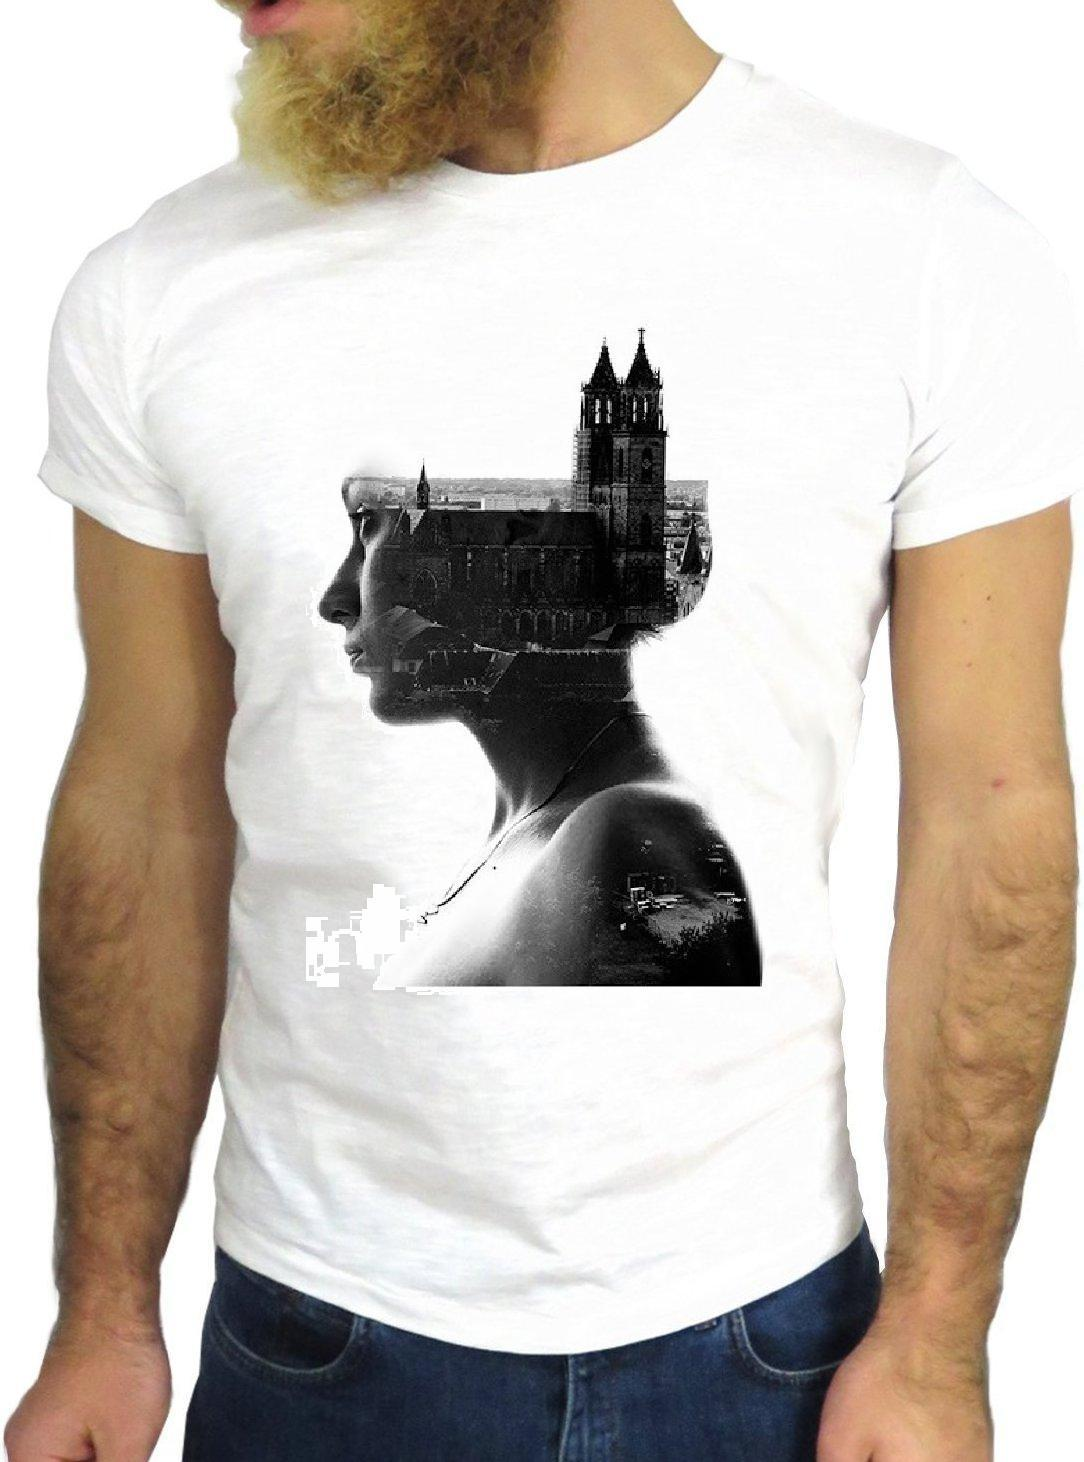 Mens Heißer 2018 Sommer Männer Kurzen Ärmeln T Hemd Z0923 Mädchen Stadt Coole Vintage Felsen Lustige Mode Cartoon Schönen Skater t-shirt